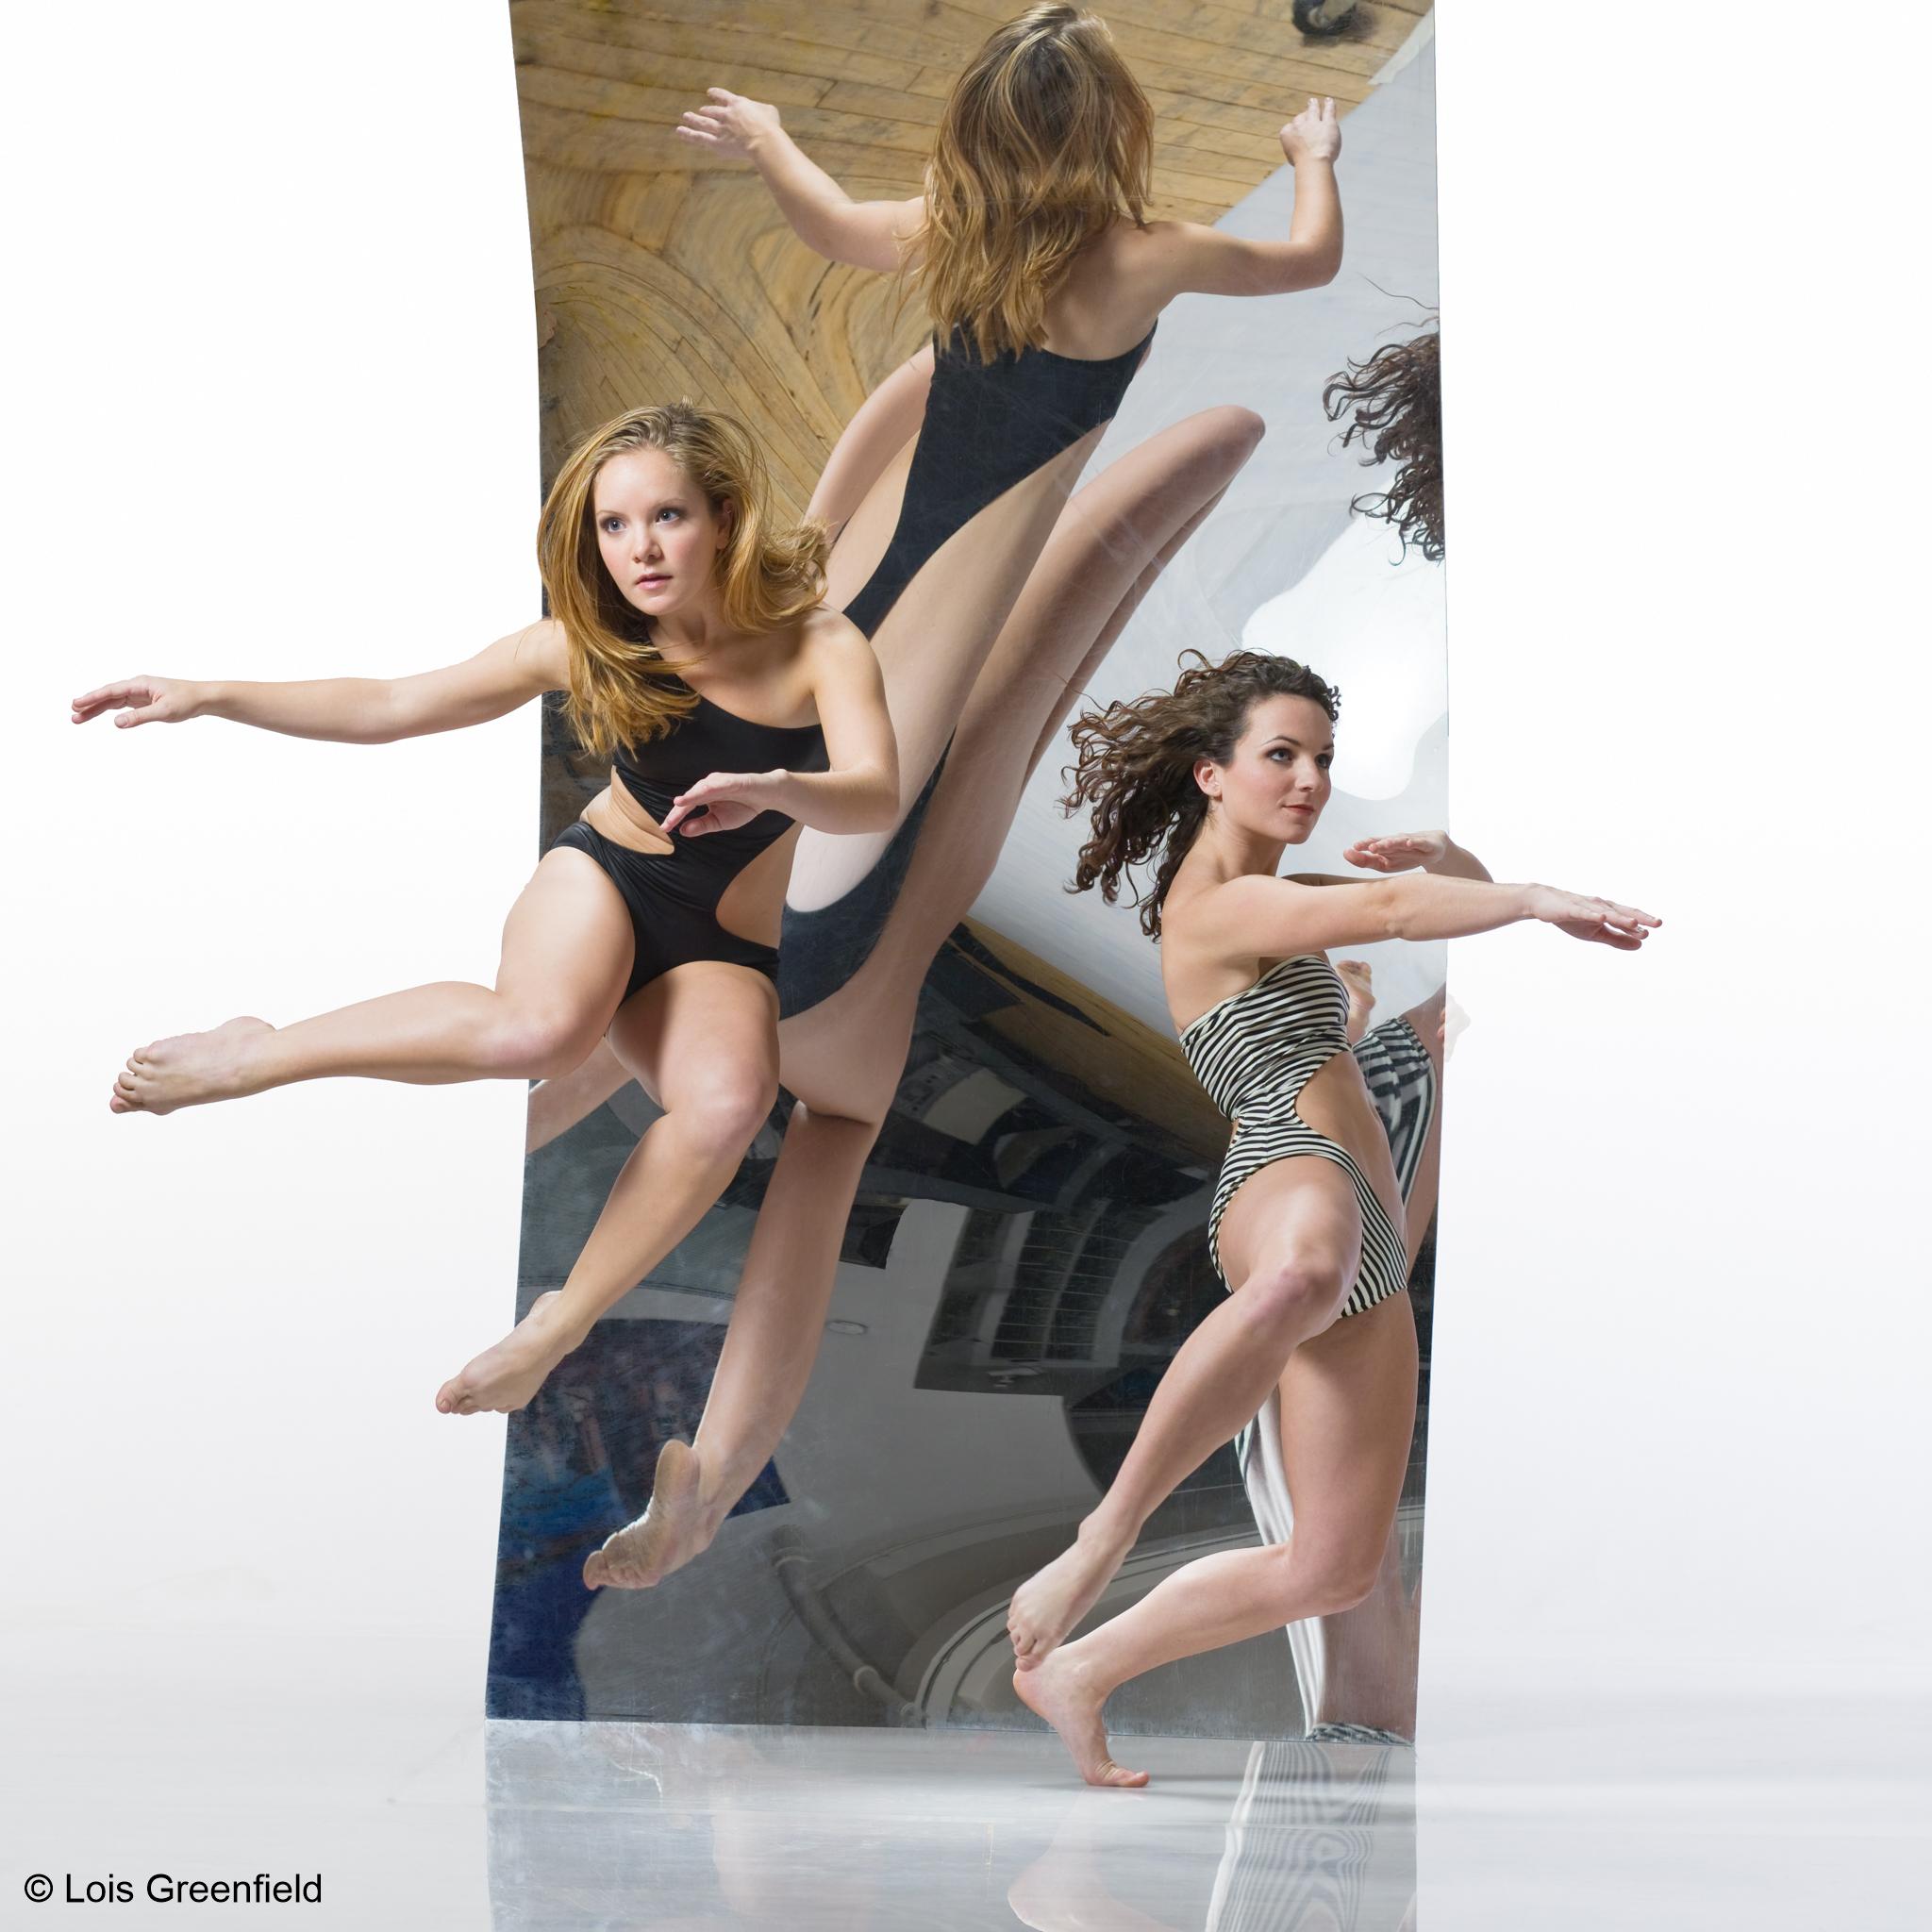 Shannon MacDowell and Kimberly Lyons of Amy Marshall Dance Company